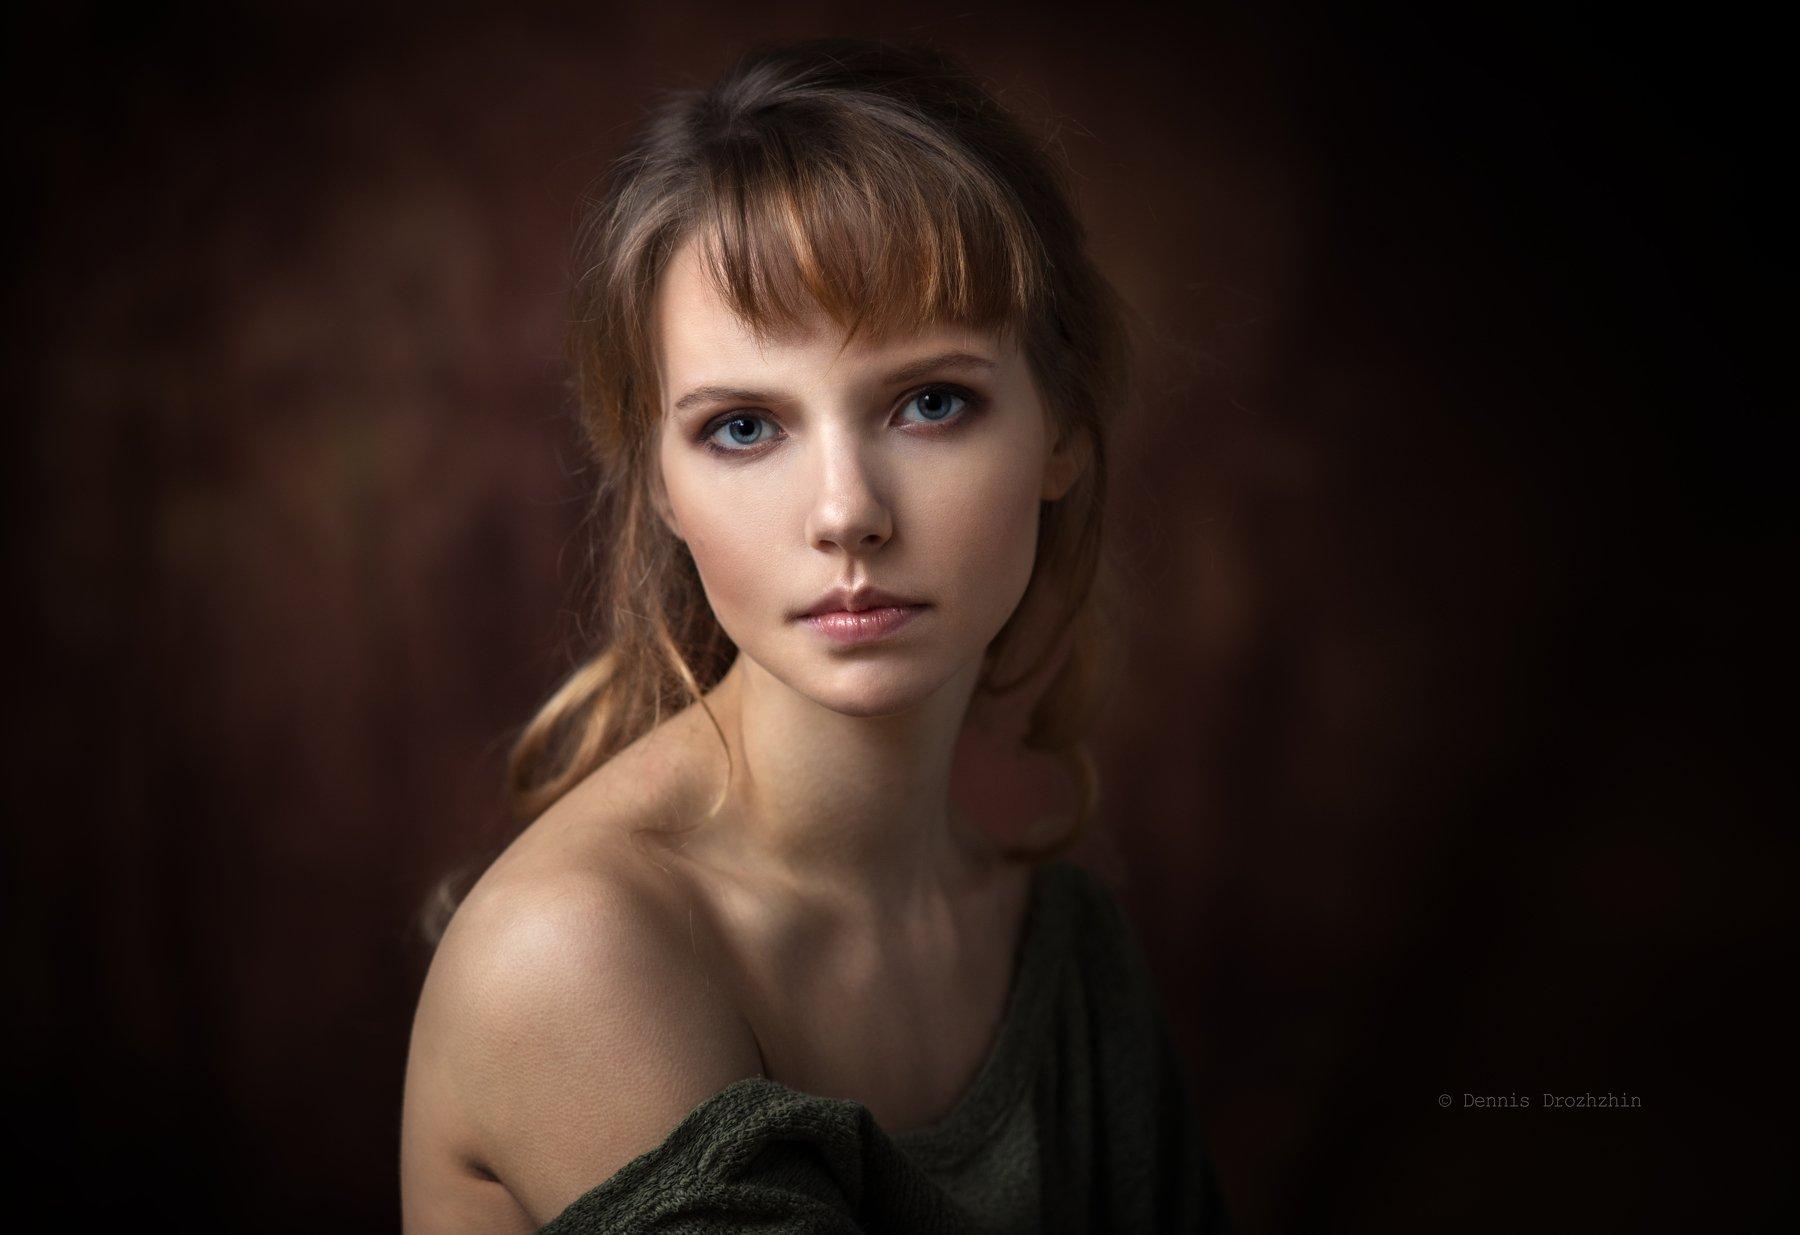 Drozhzhin, natural light, portrait, Денис Дрожжин